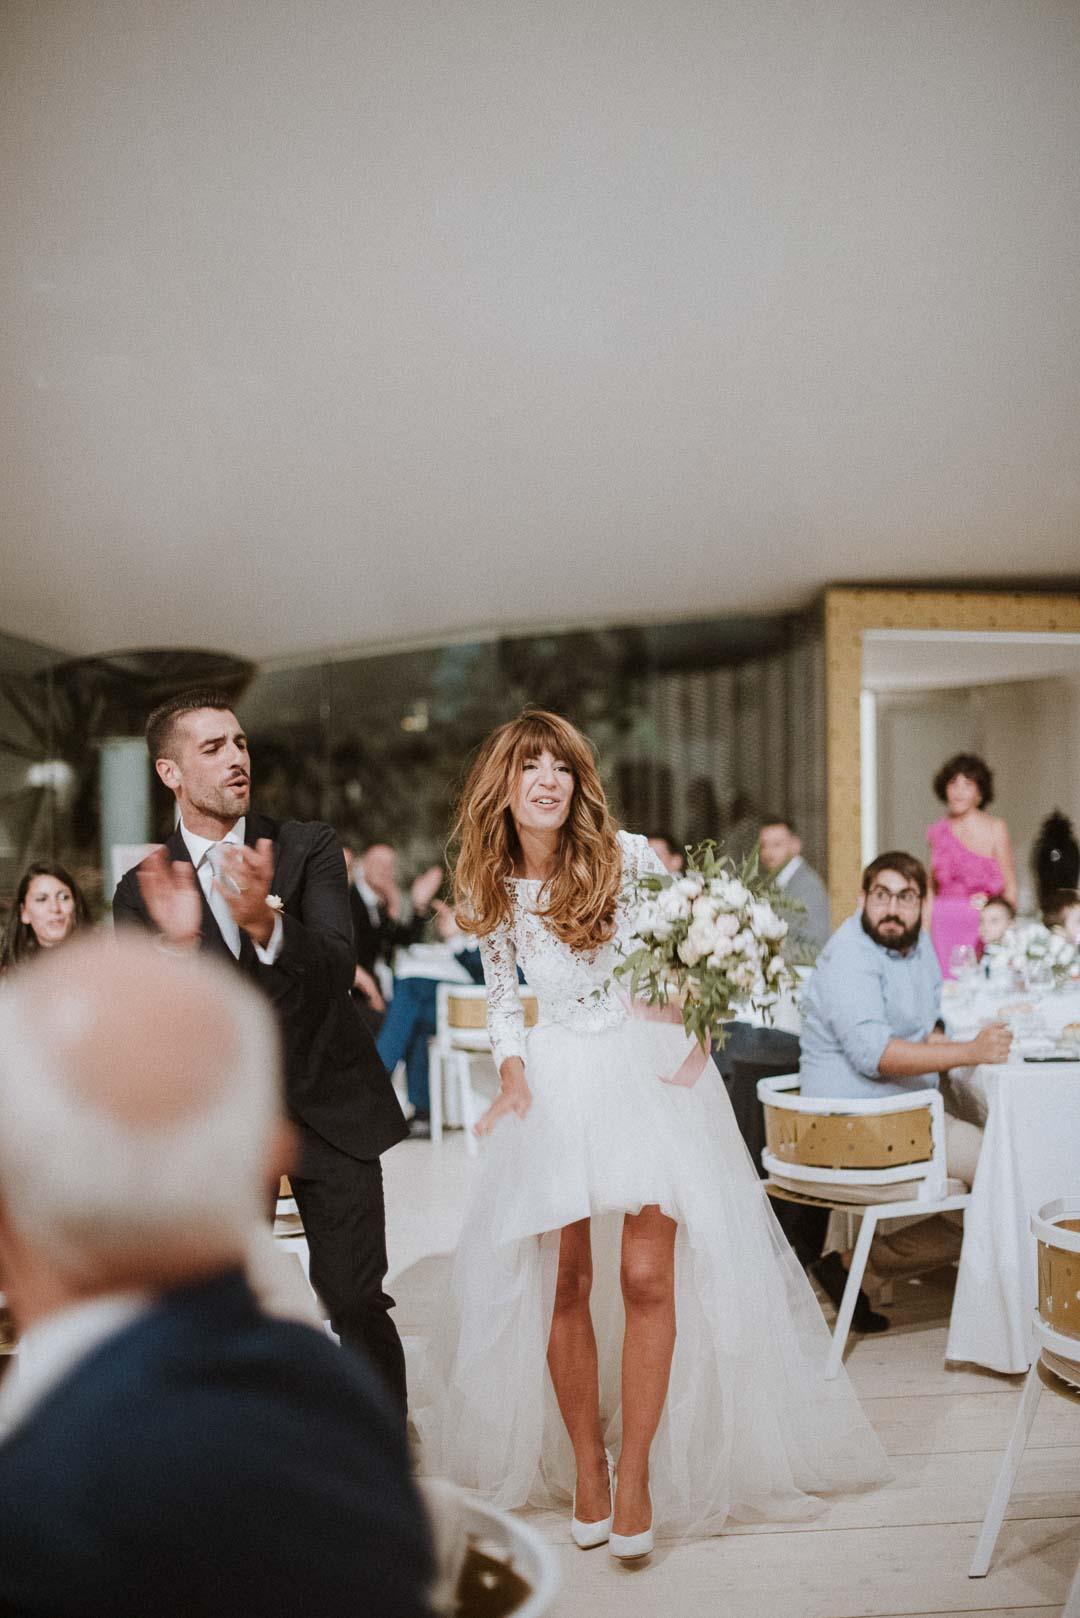 wedding-photographer-destination-fineart-bespoke-reportage-napoli-nabilah-vivianeizzo-spazio46-171